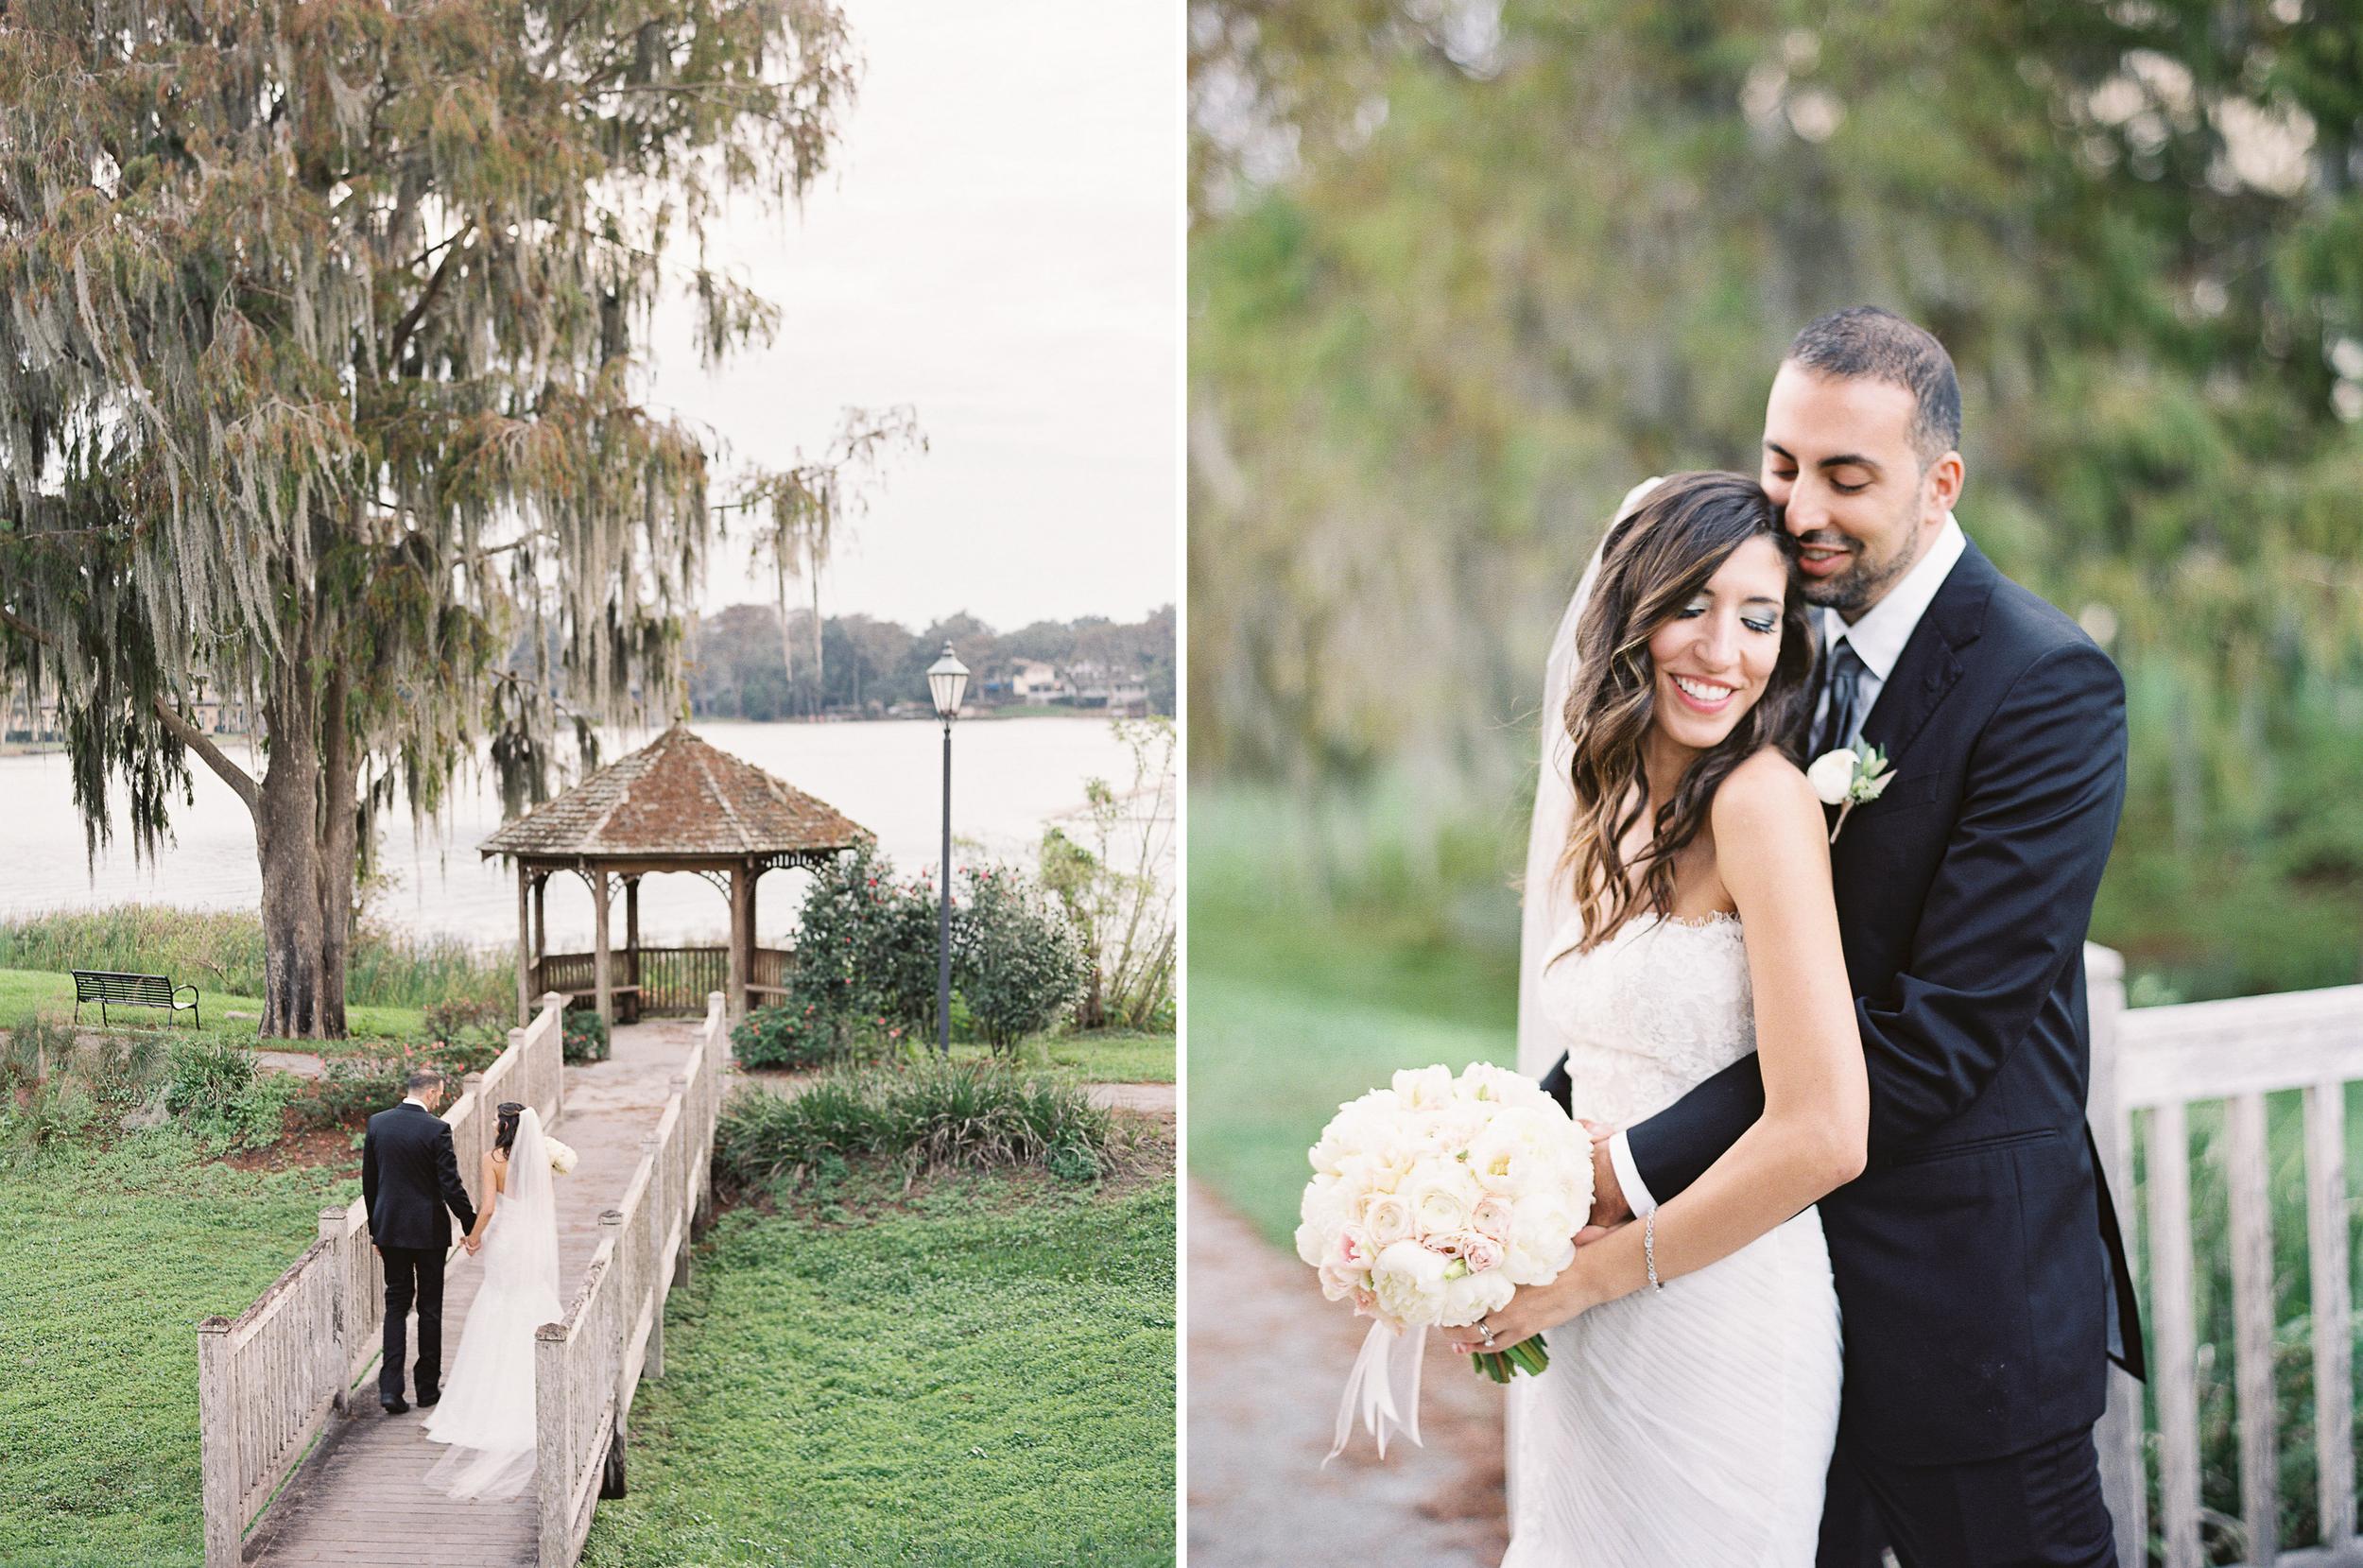 Beautiful Outdoor Wedding in Florida Groom Kissing Bride Photos